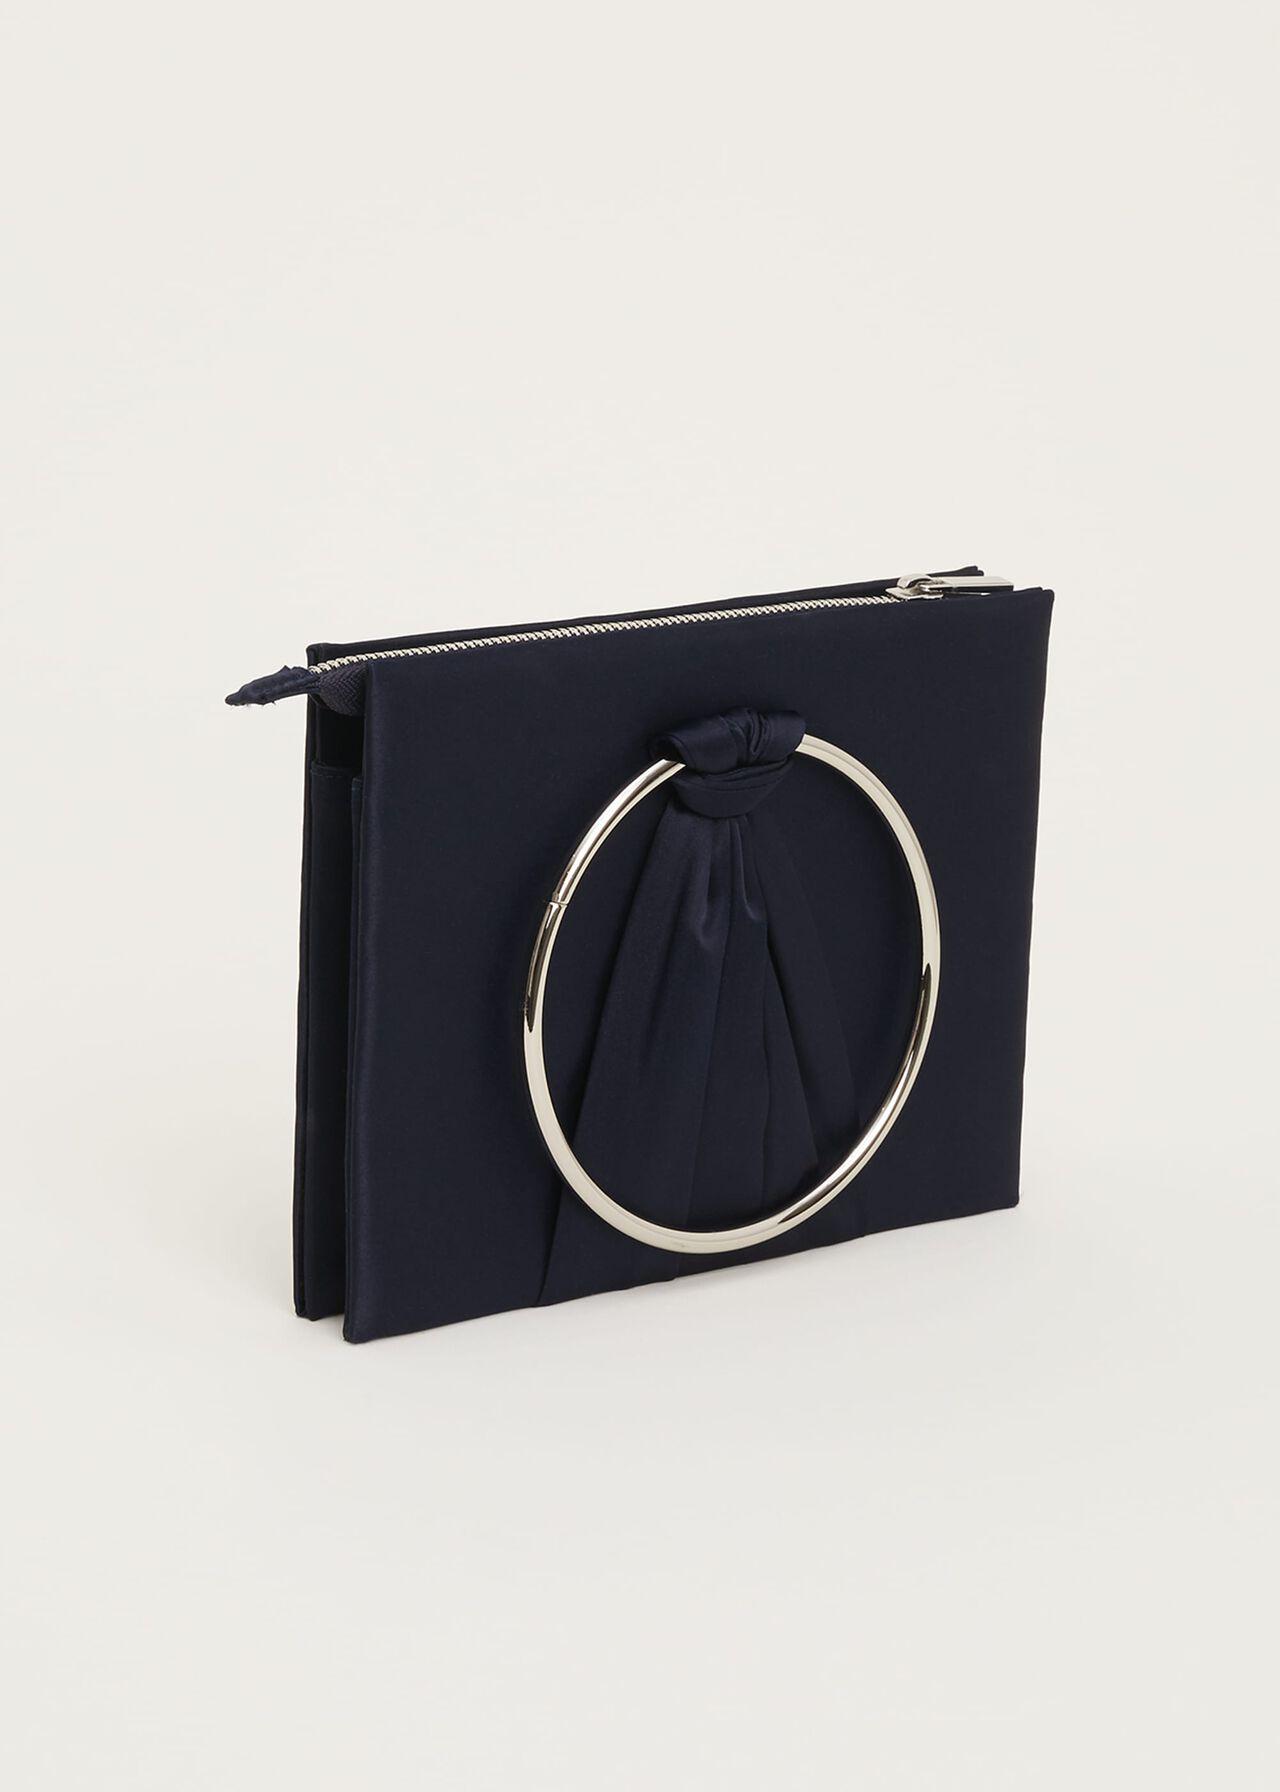 Rhia Ring Clutch Bag